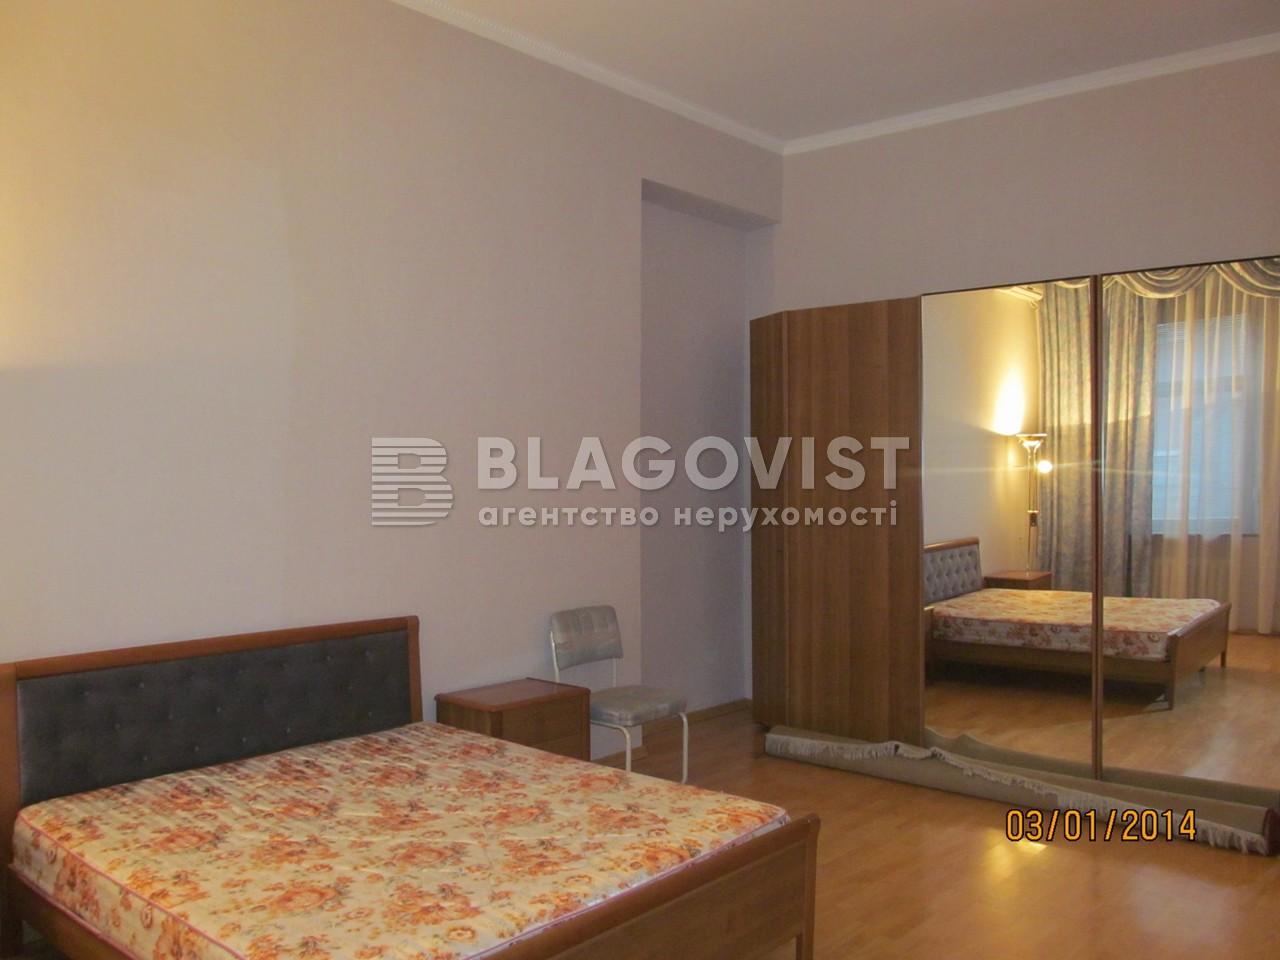 Квартира G-12026, Городецкого Архитектора, 11б, Киев - Фото 9